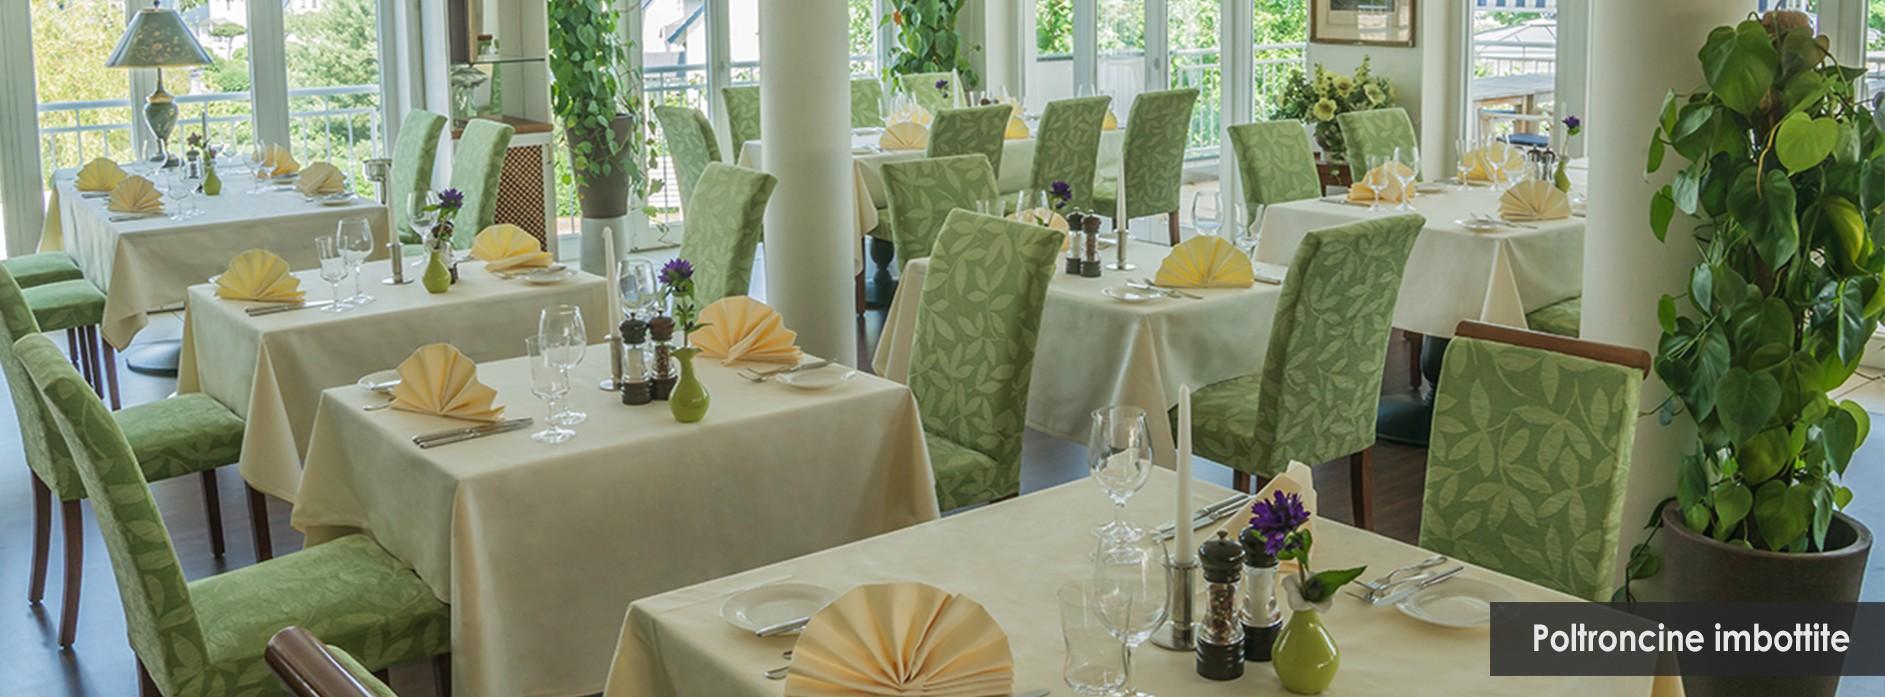 arredacontract.it | sedie e tavoli per ristoranti, bar, hotel e ... - Tavoli Sedie Ristorante